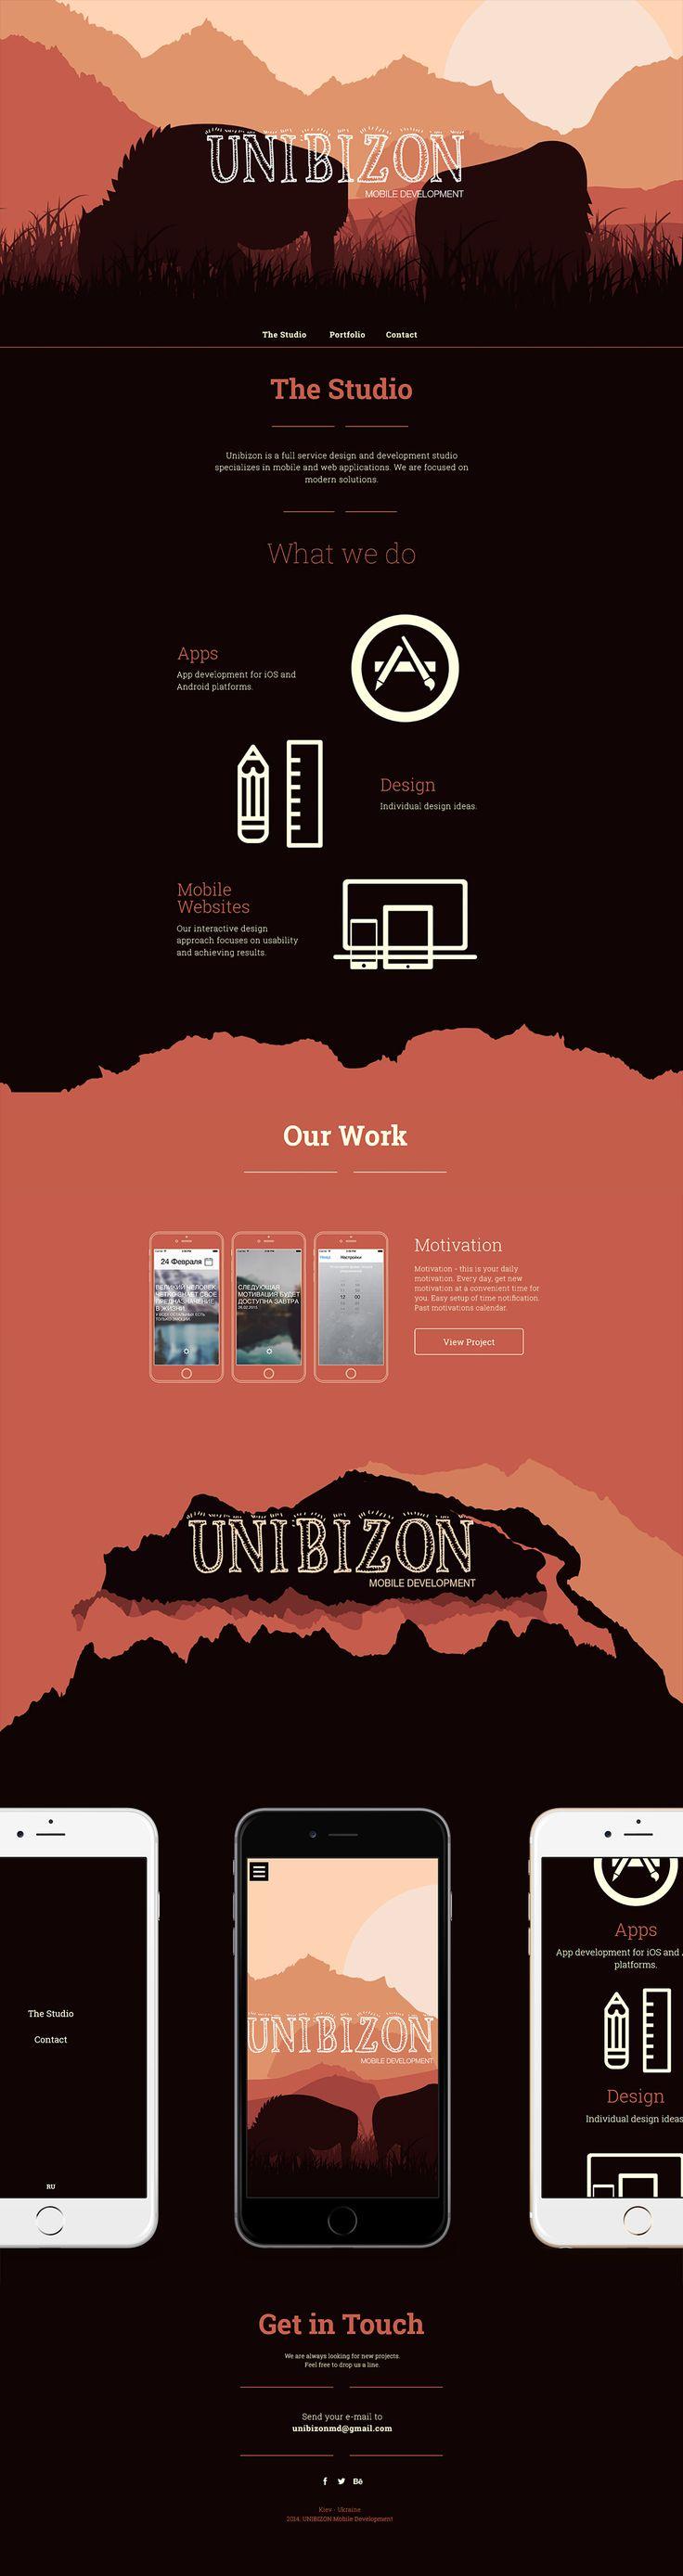 Unibizon. Recreate a scene of 10,000 BC. #webdesign #design (More design inspiration at www.aldenchong.com)